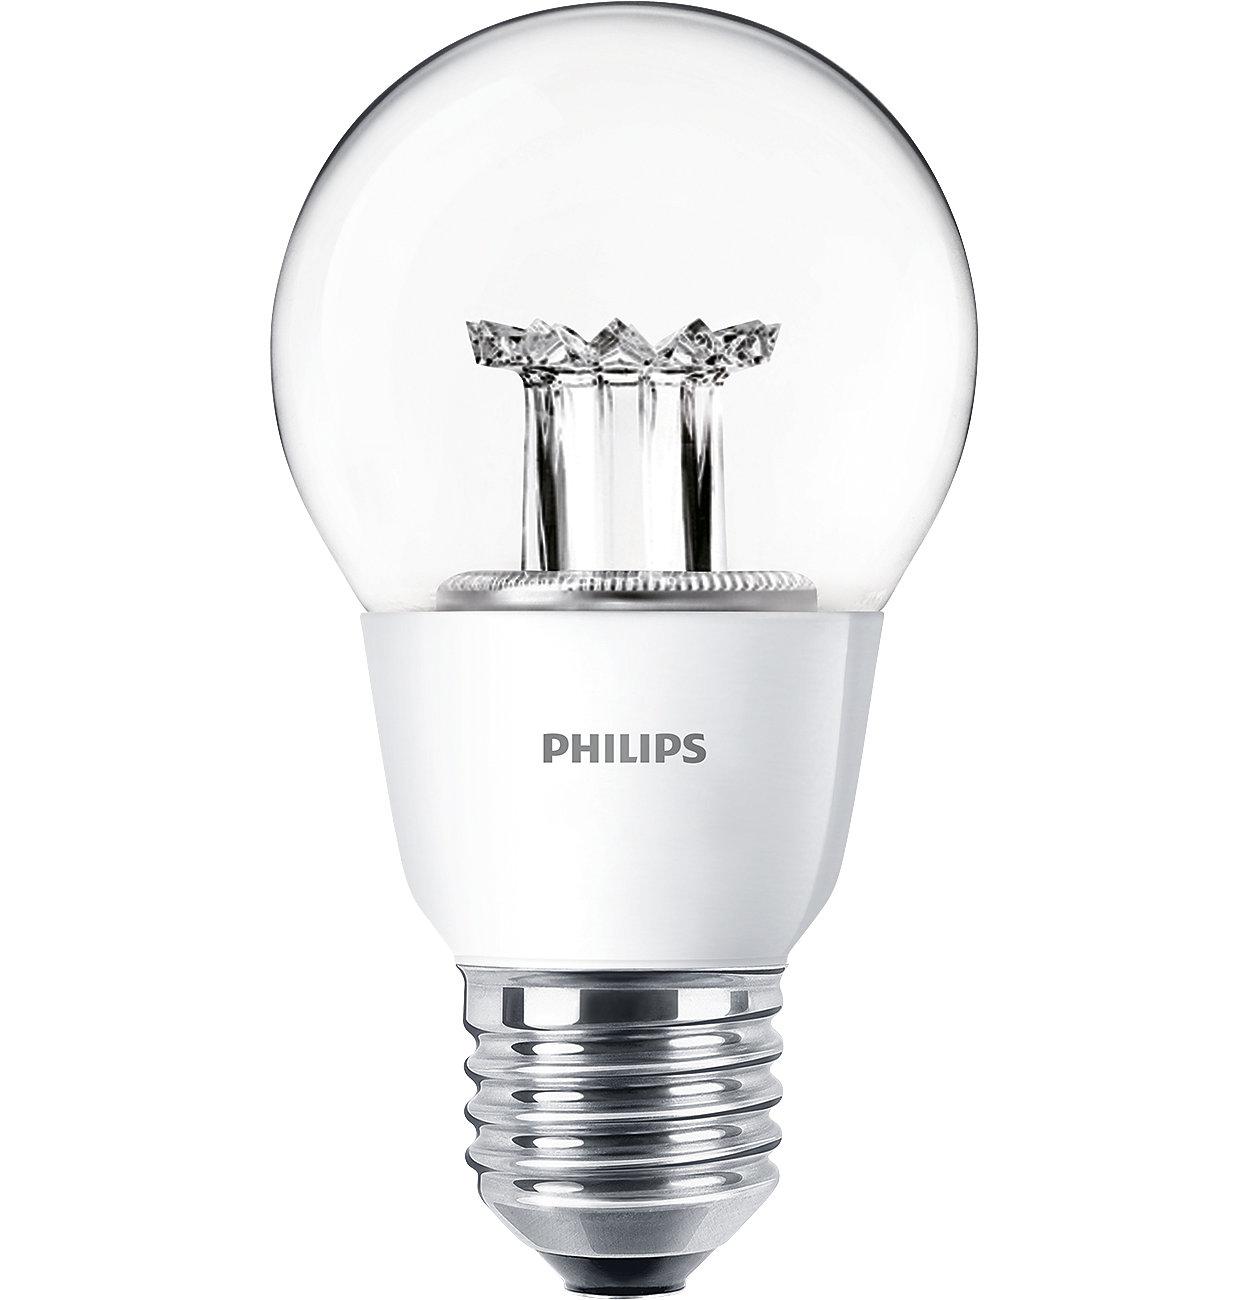 MASTER LEDbulb - Elegance meets efficiency